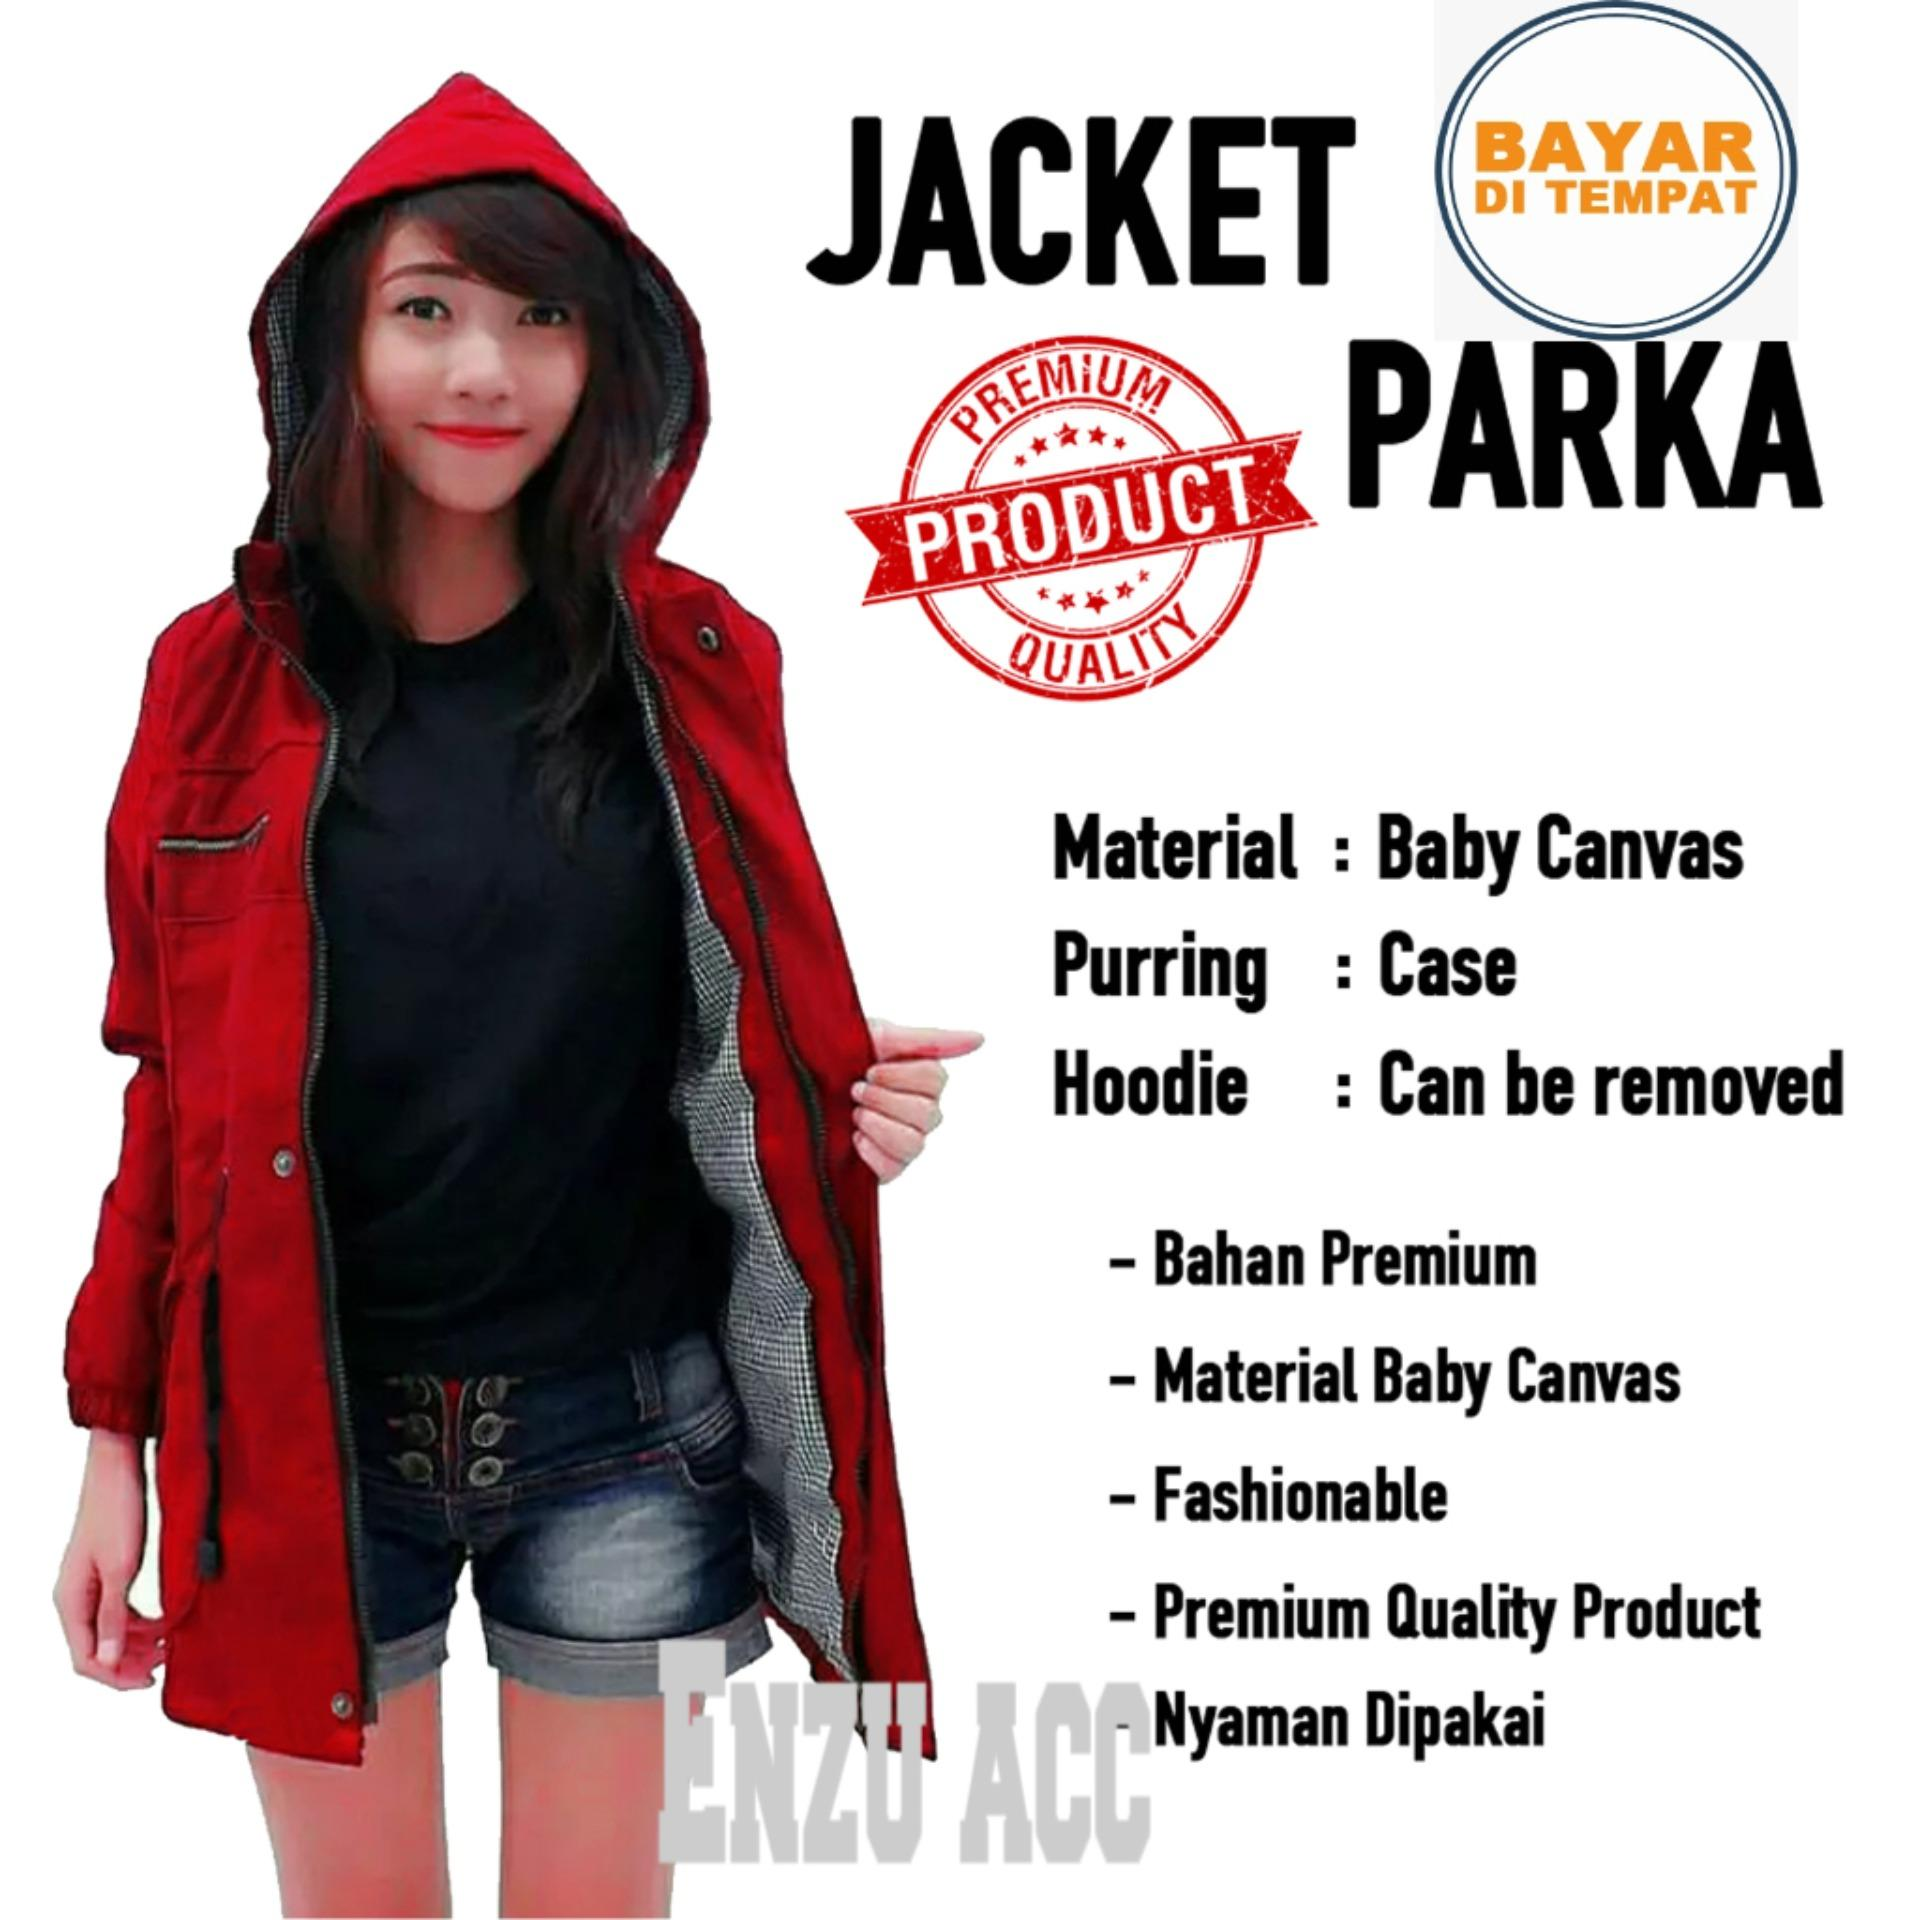 Enzu Acc Jaket Parka Wanita Canvas Baby Premium Bolak Balik Maroon Di Dki Jakarta